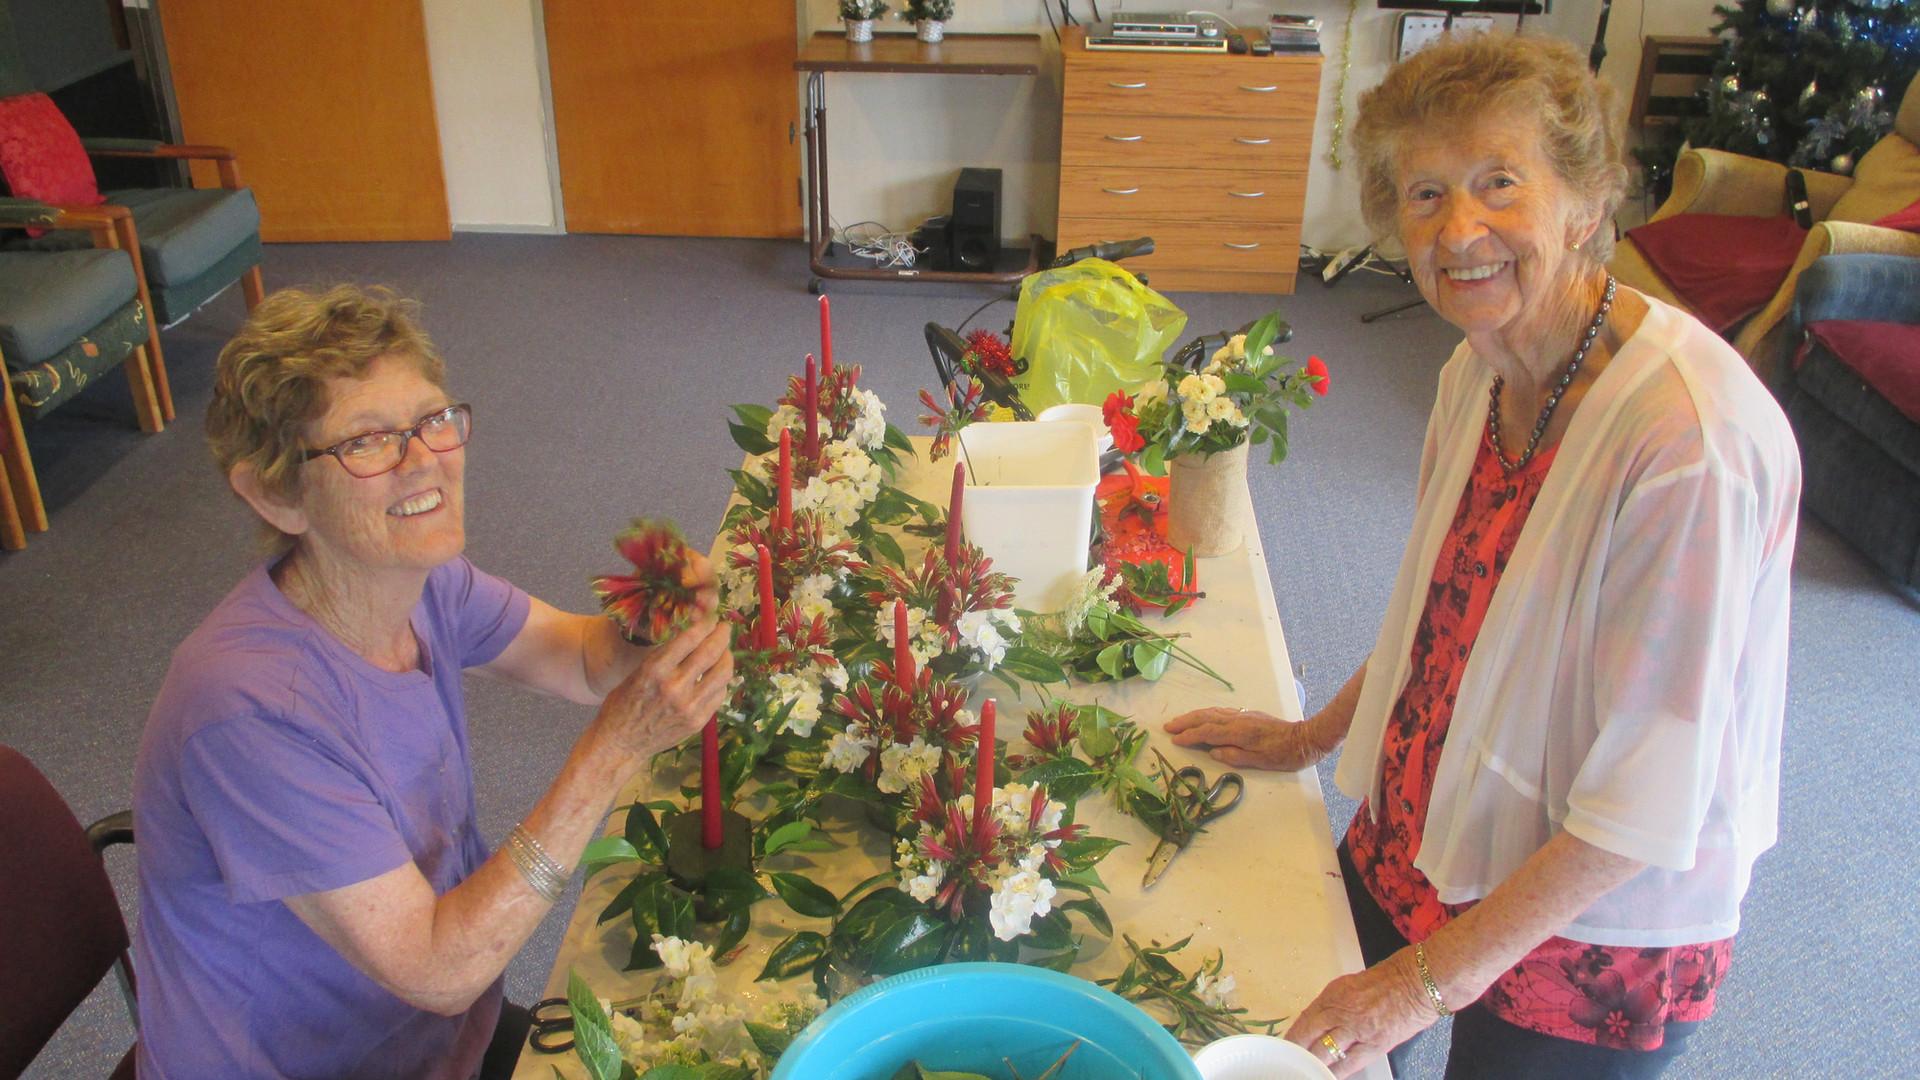 Chris & Dorothy making Christmas table decorations